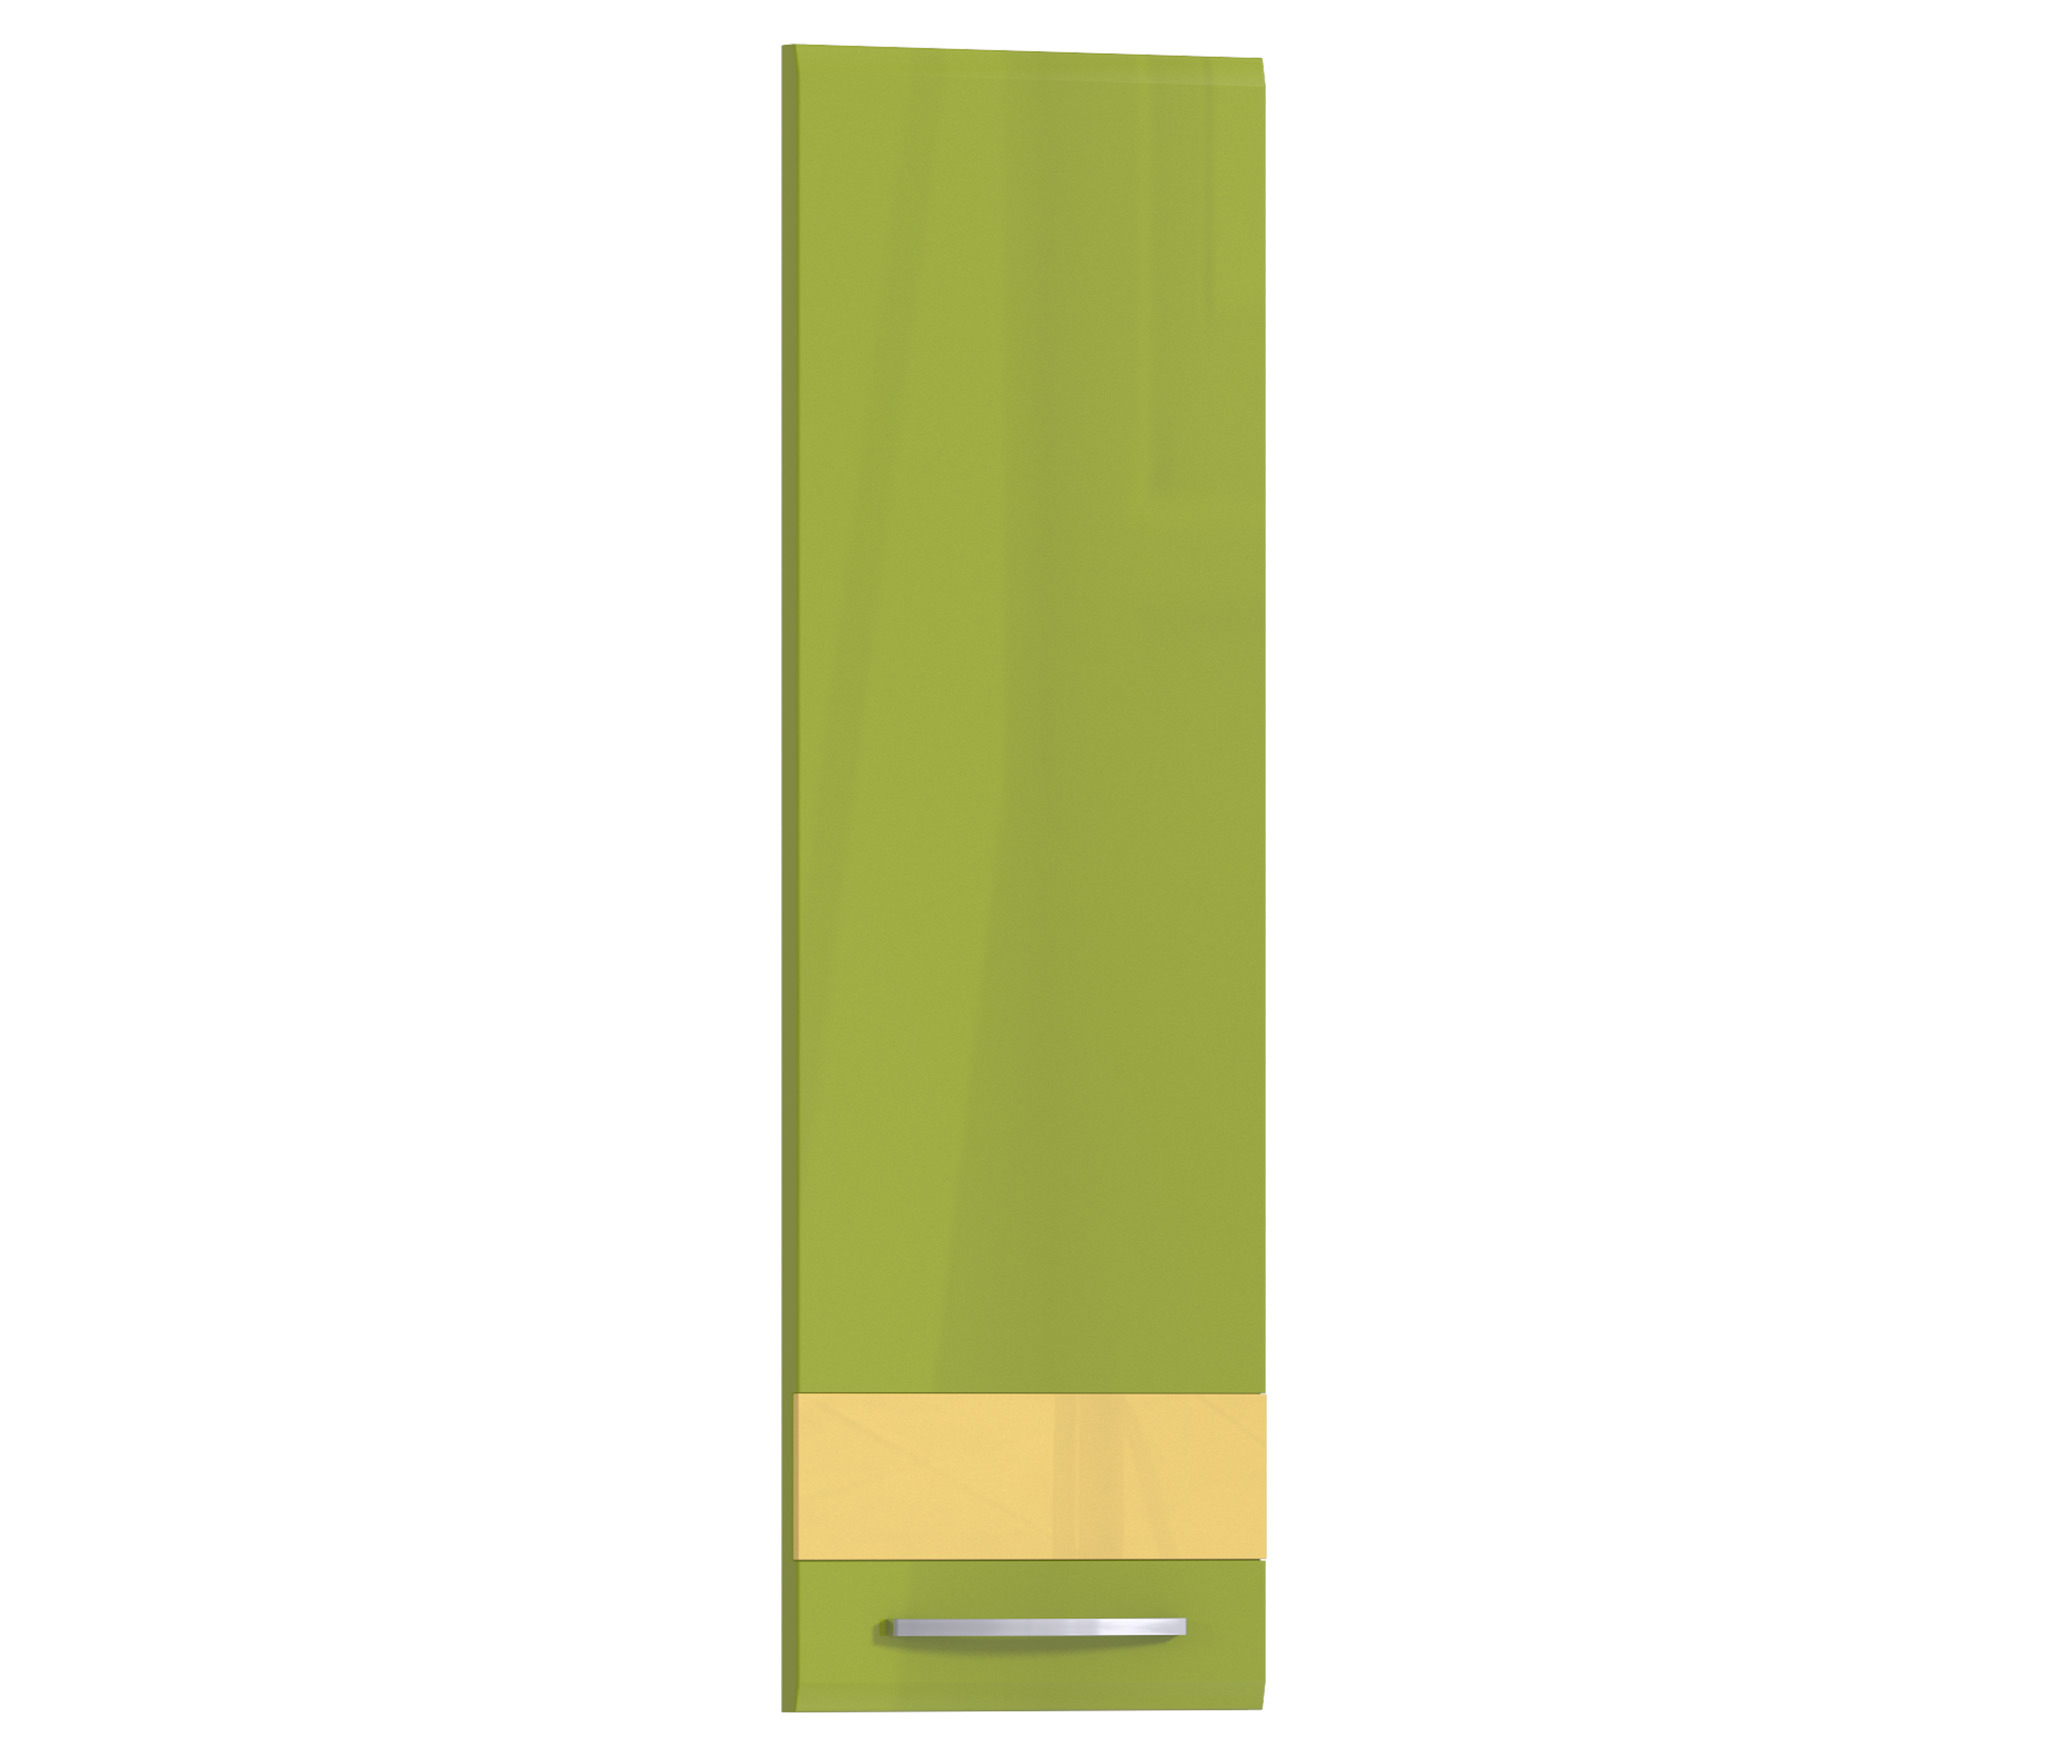 Фасад Регина Ф-130 к корпусу РП-160, РП-130Н, РПТУ-130Мебель для кухни<br>Рельефная дверца шкафа.<br><br>Длина мм: 296<br>Высота мм: 920<br>Глубина мм: 22